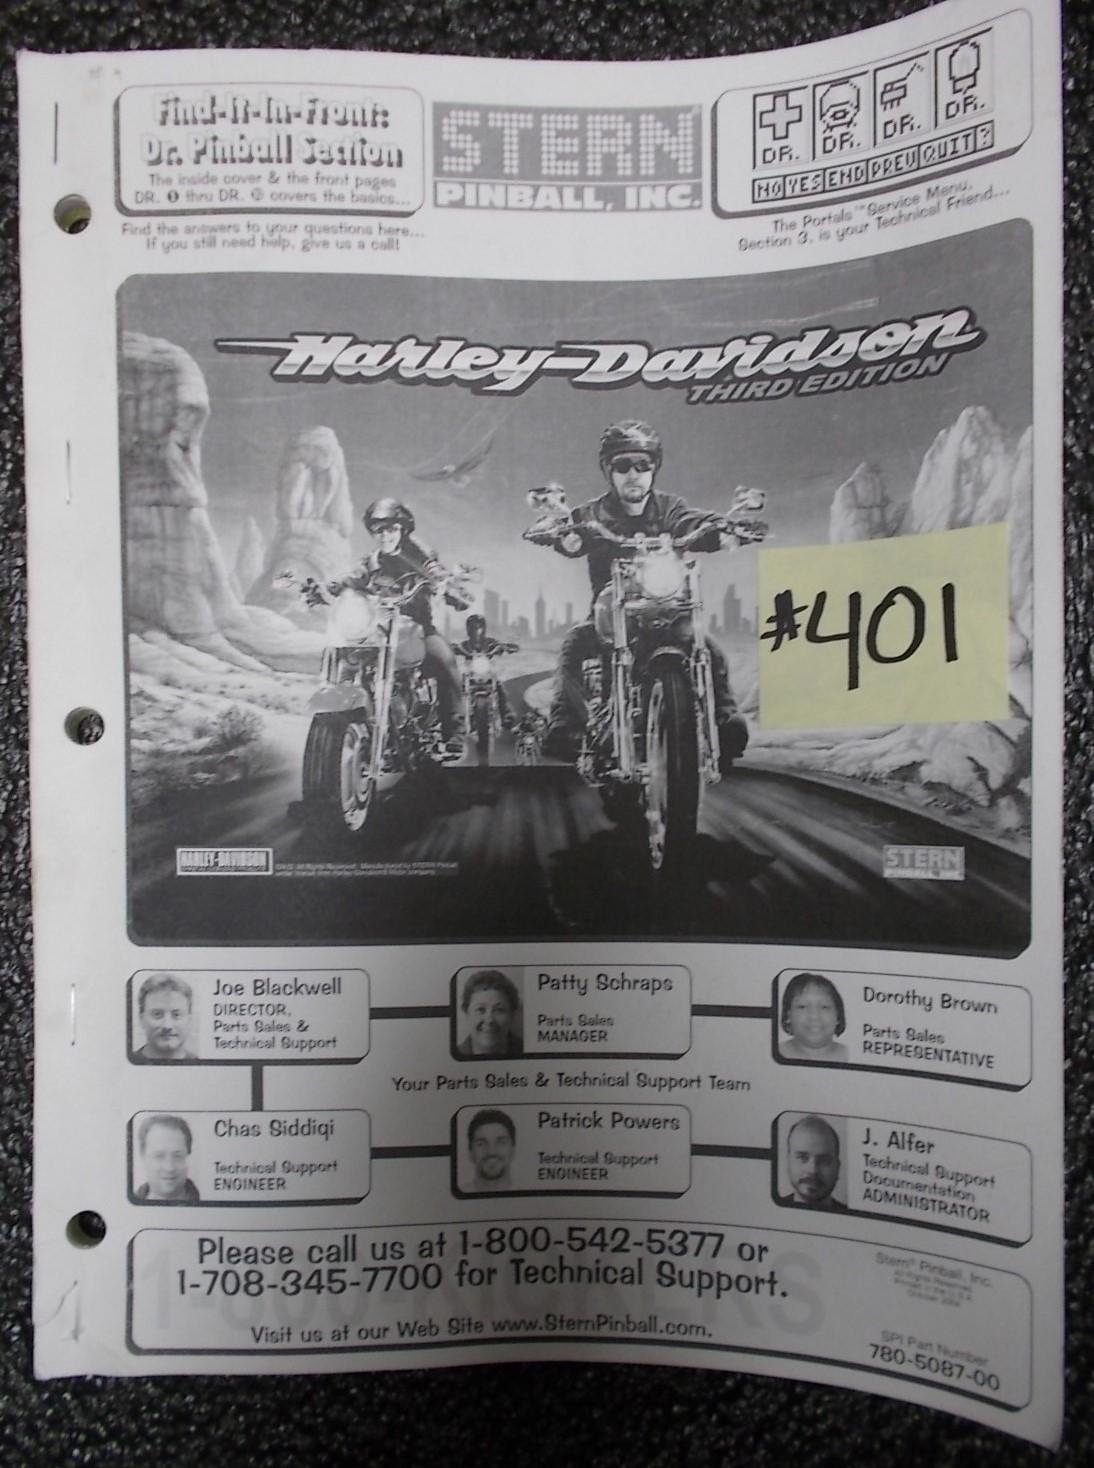 Harley Davidson Arcade Game Manual